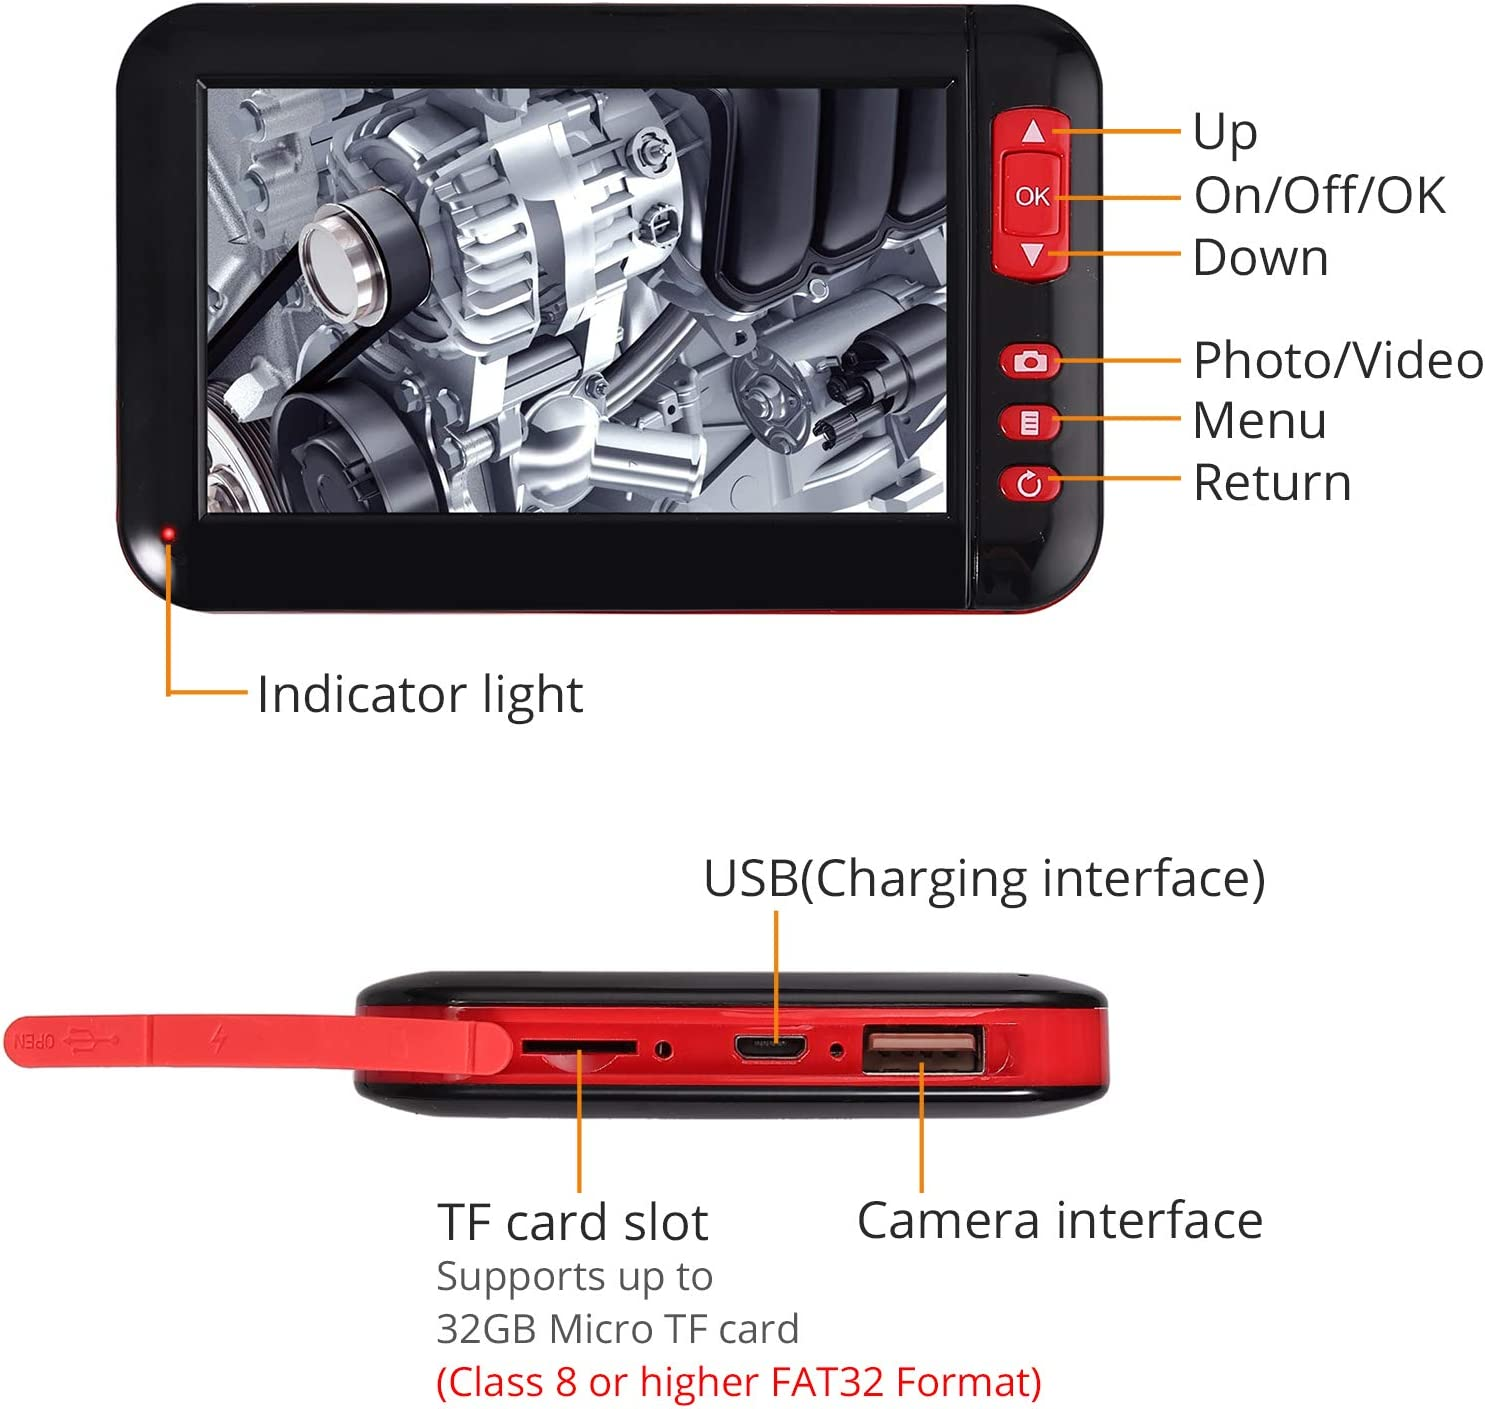 Neoteck Endoscopio Industrial IP68 Impermeable Inspecci/ón Impermeable con Pantalla de Monitor LCD C/ámara de 8 mm de Di/ámetro con 8 Luces LED /Ángulo de Lente de 70/°y Cable Flexible de 5 m